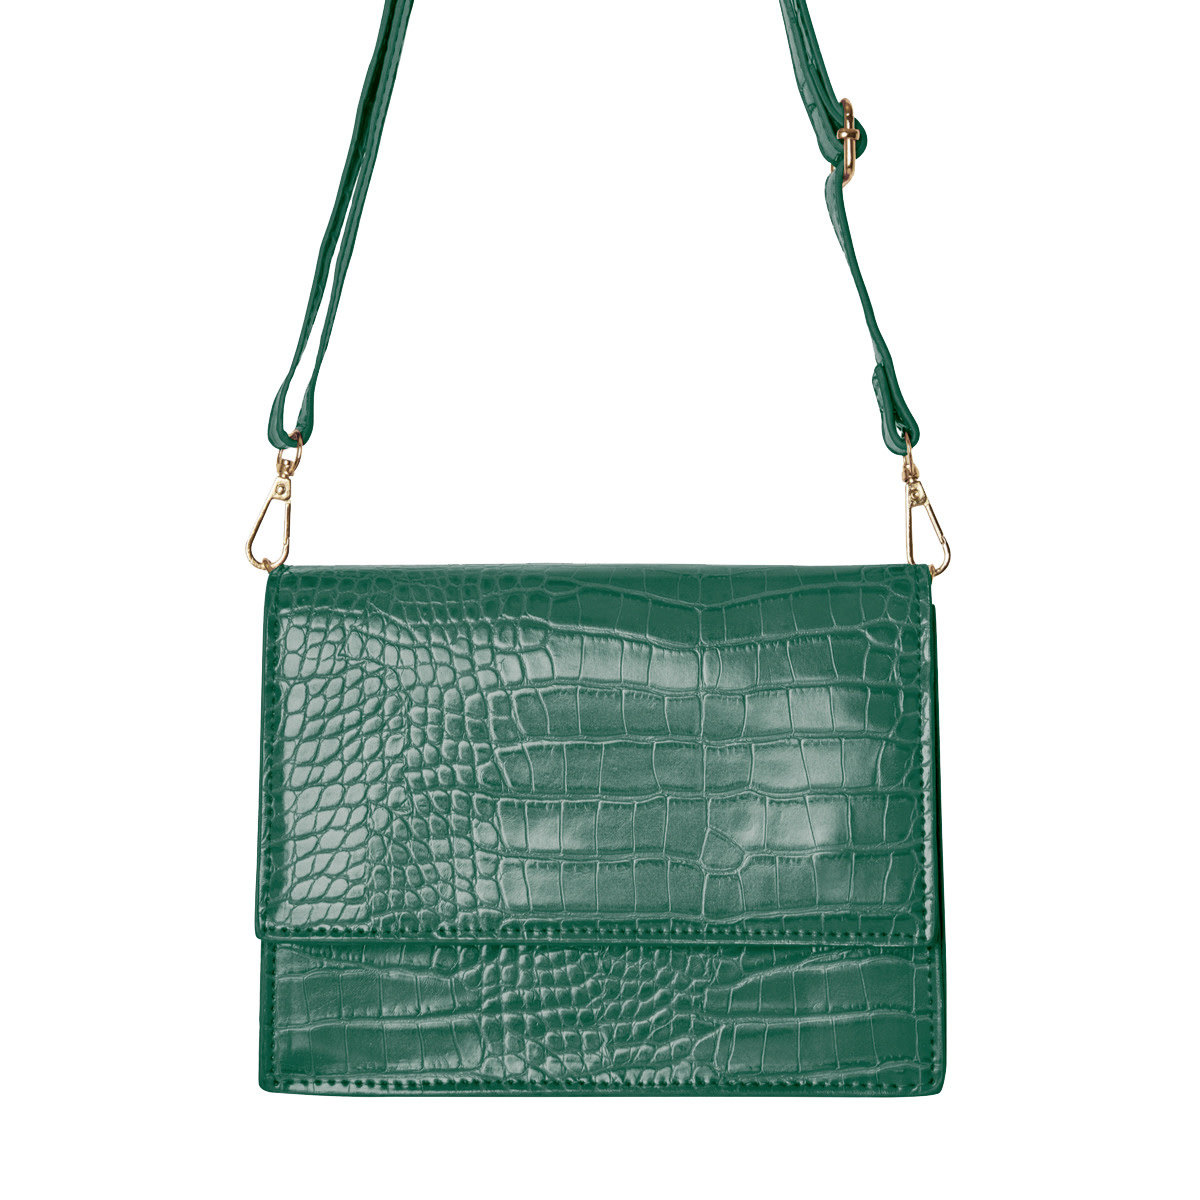 With love Bag Uptown girl - dark green 21cm x 13.50cm x 7cm